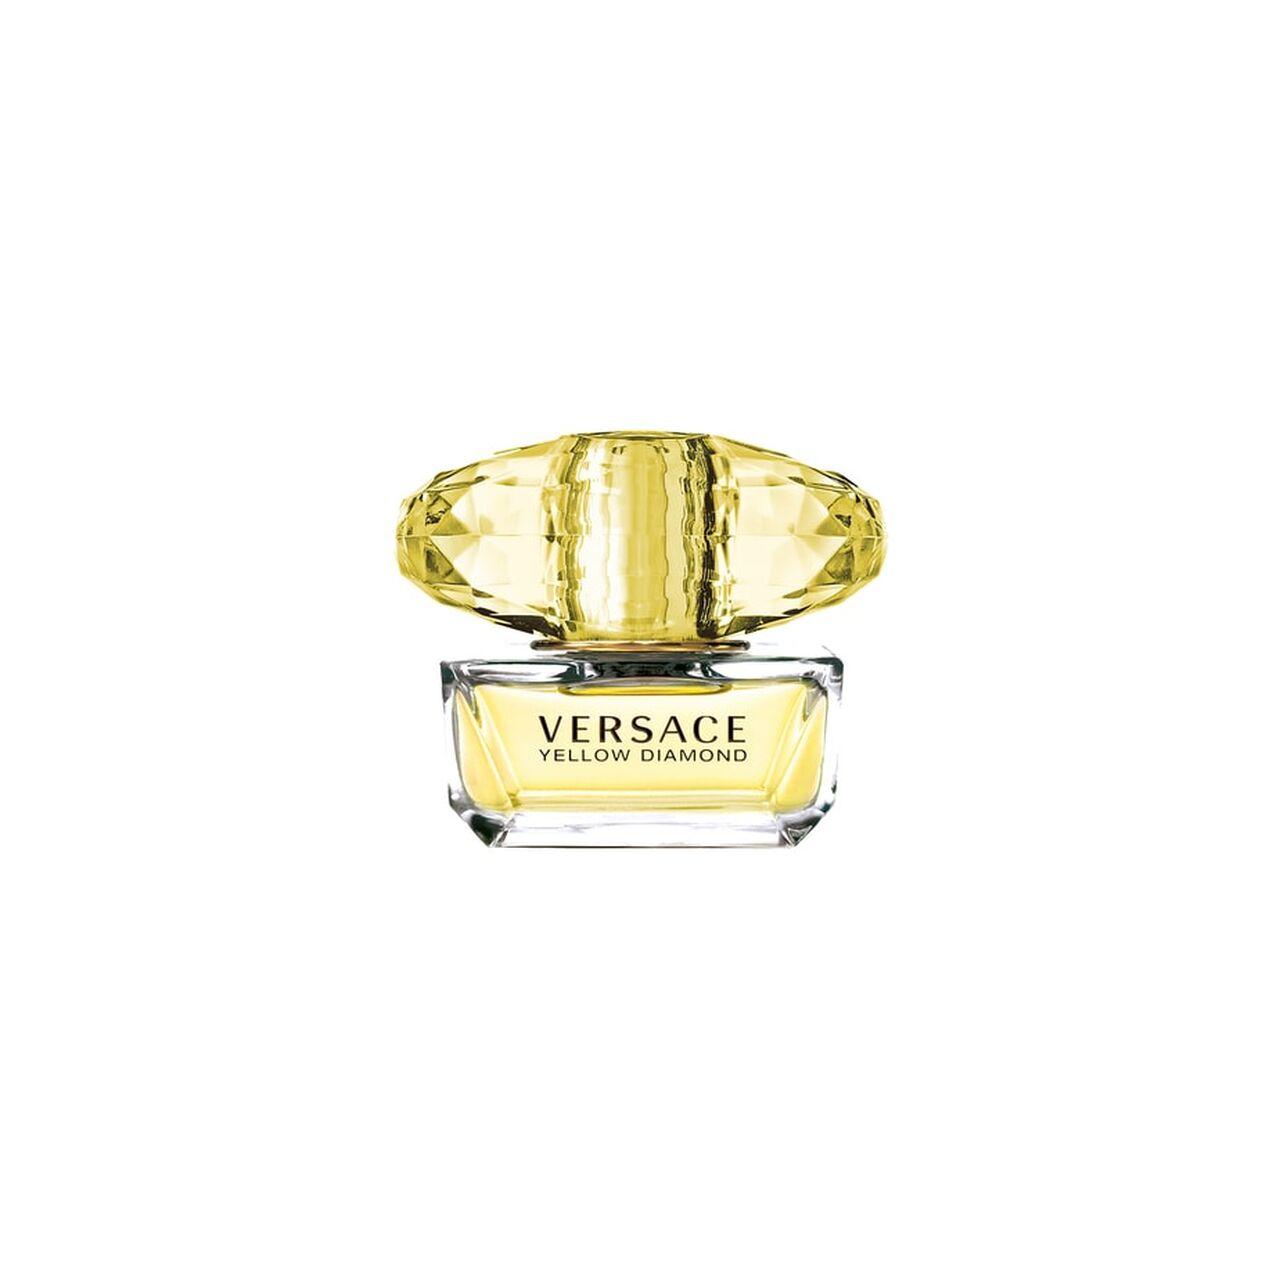 Versace Yellow Diamond EdT - 50ml